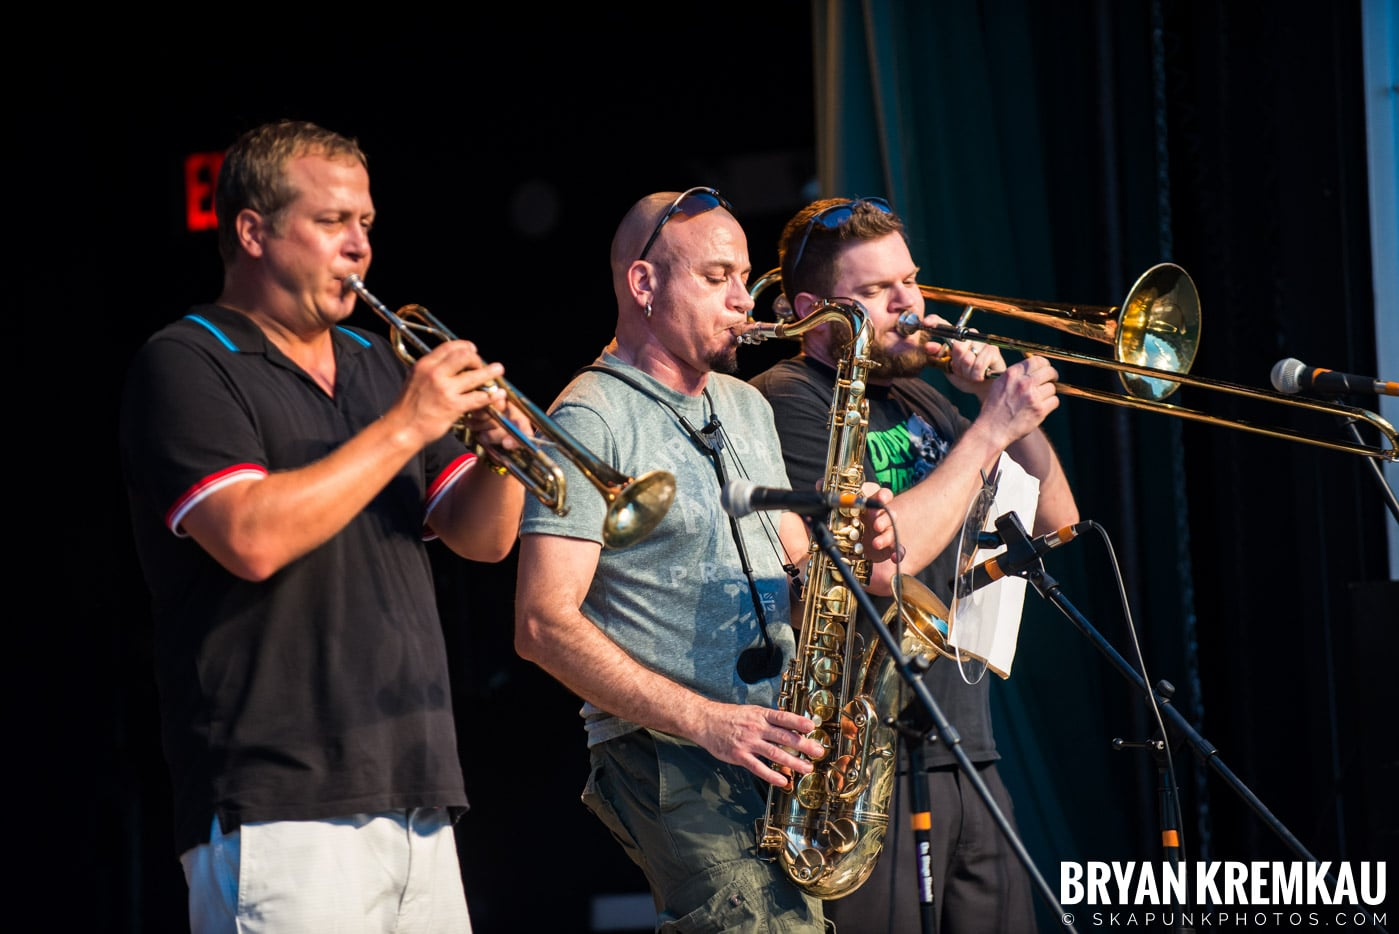 The Rudie Crew @ Oskar Schindler Performing Arts Center, West Orange, NJ - 8.19.17 (17)